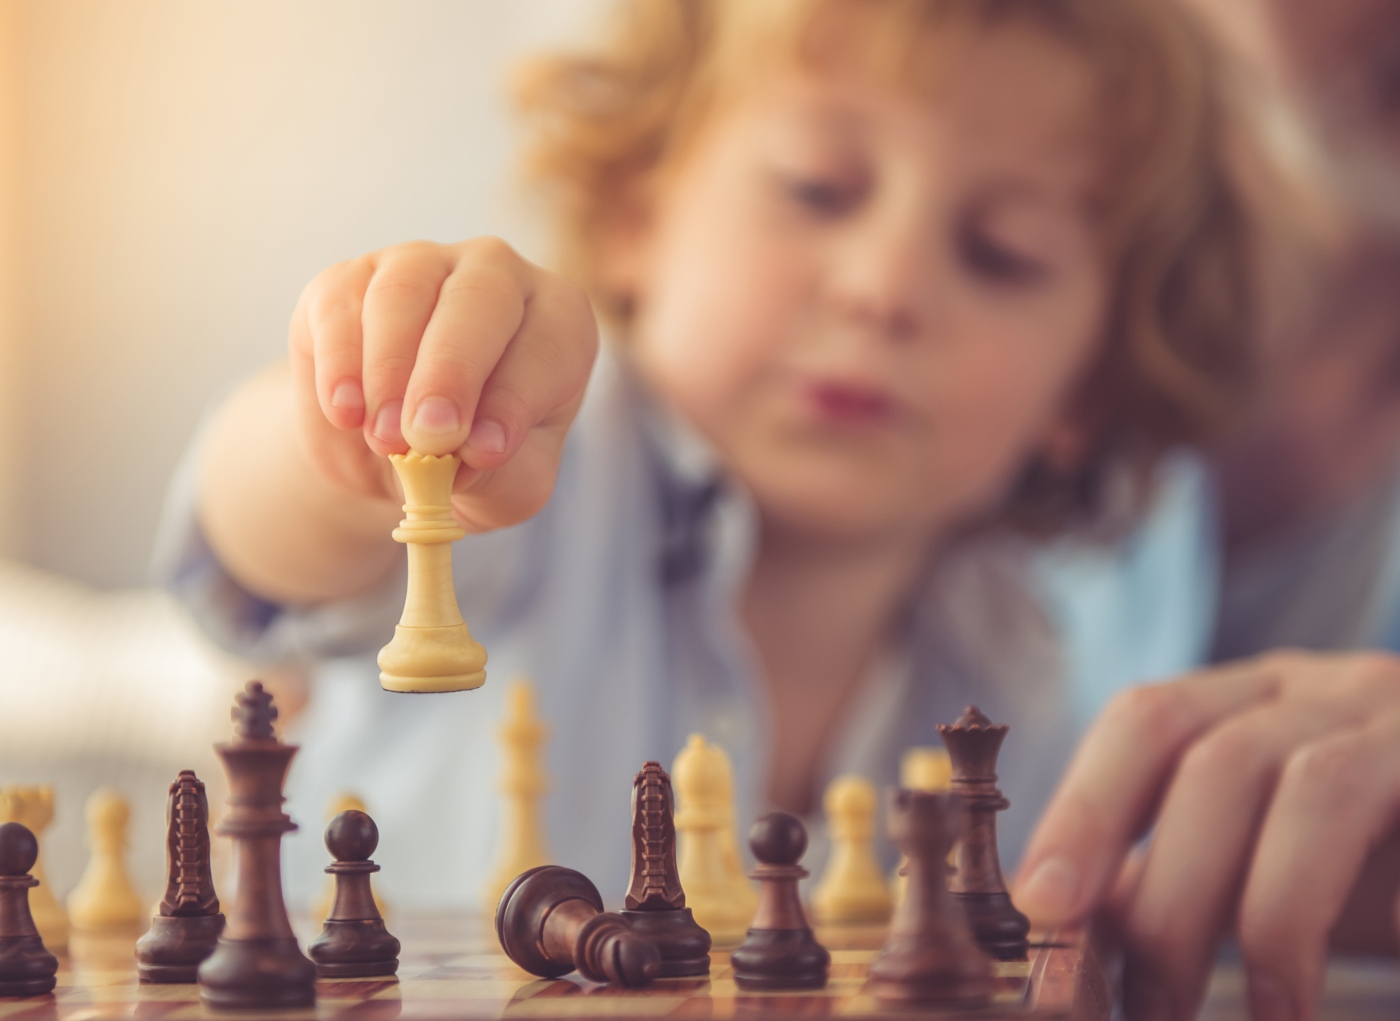 Xadrez para desenvolvimento infantil: mito ou realidade?